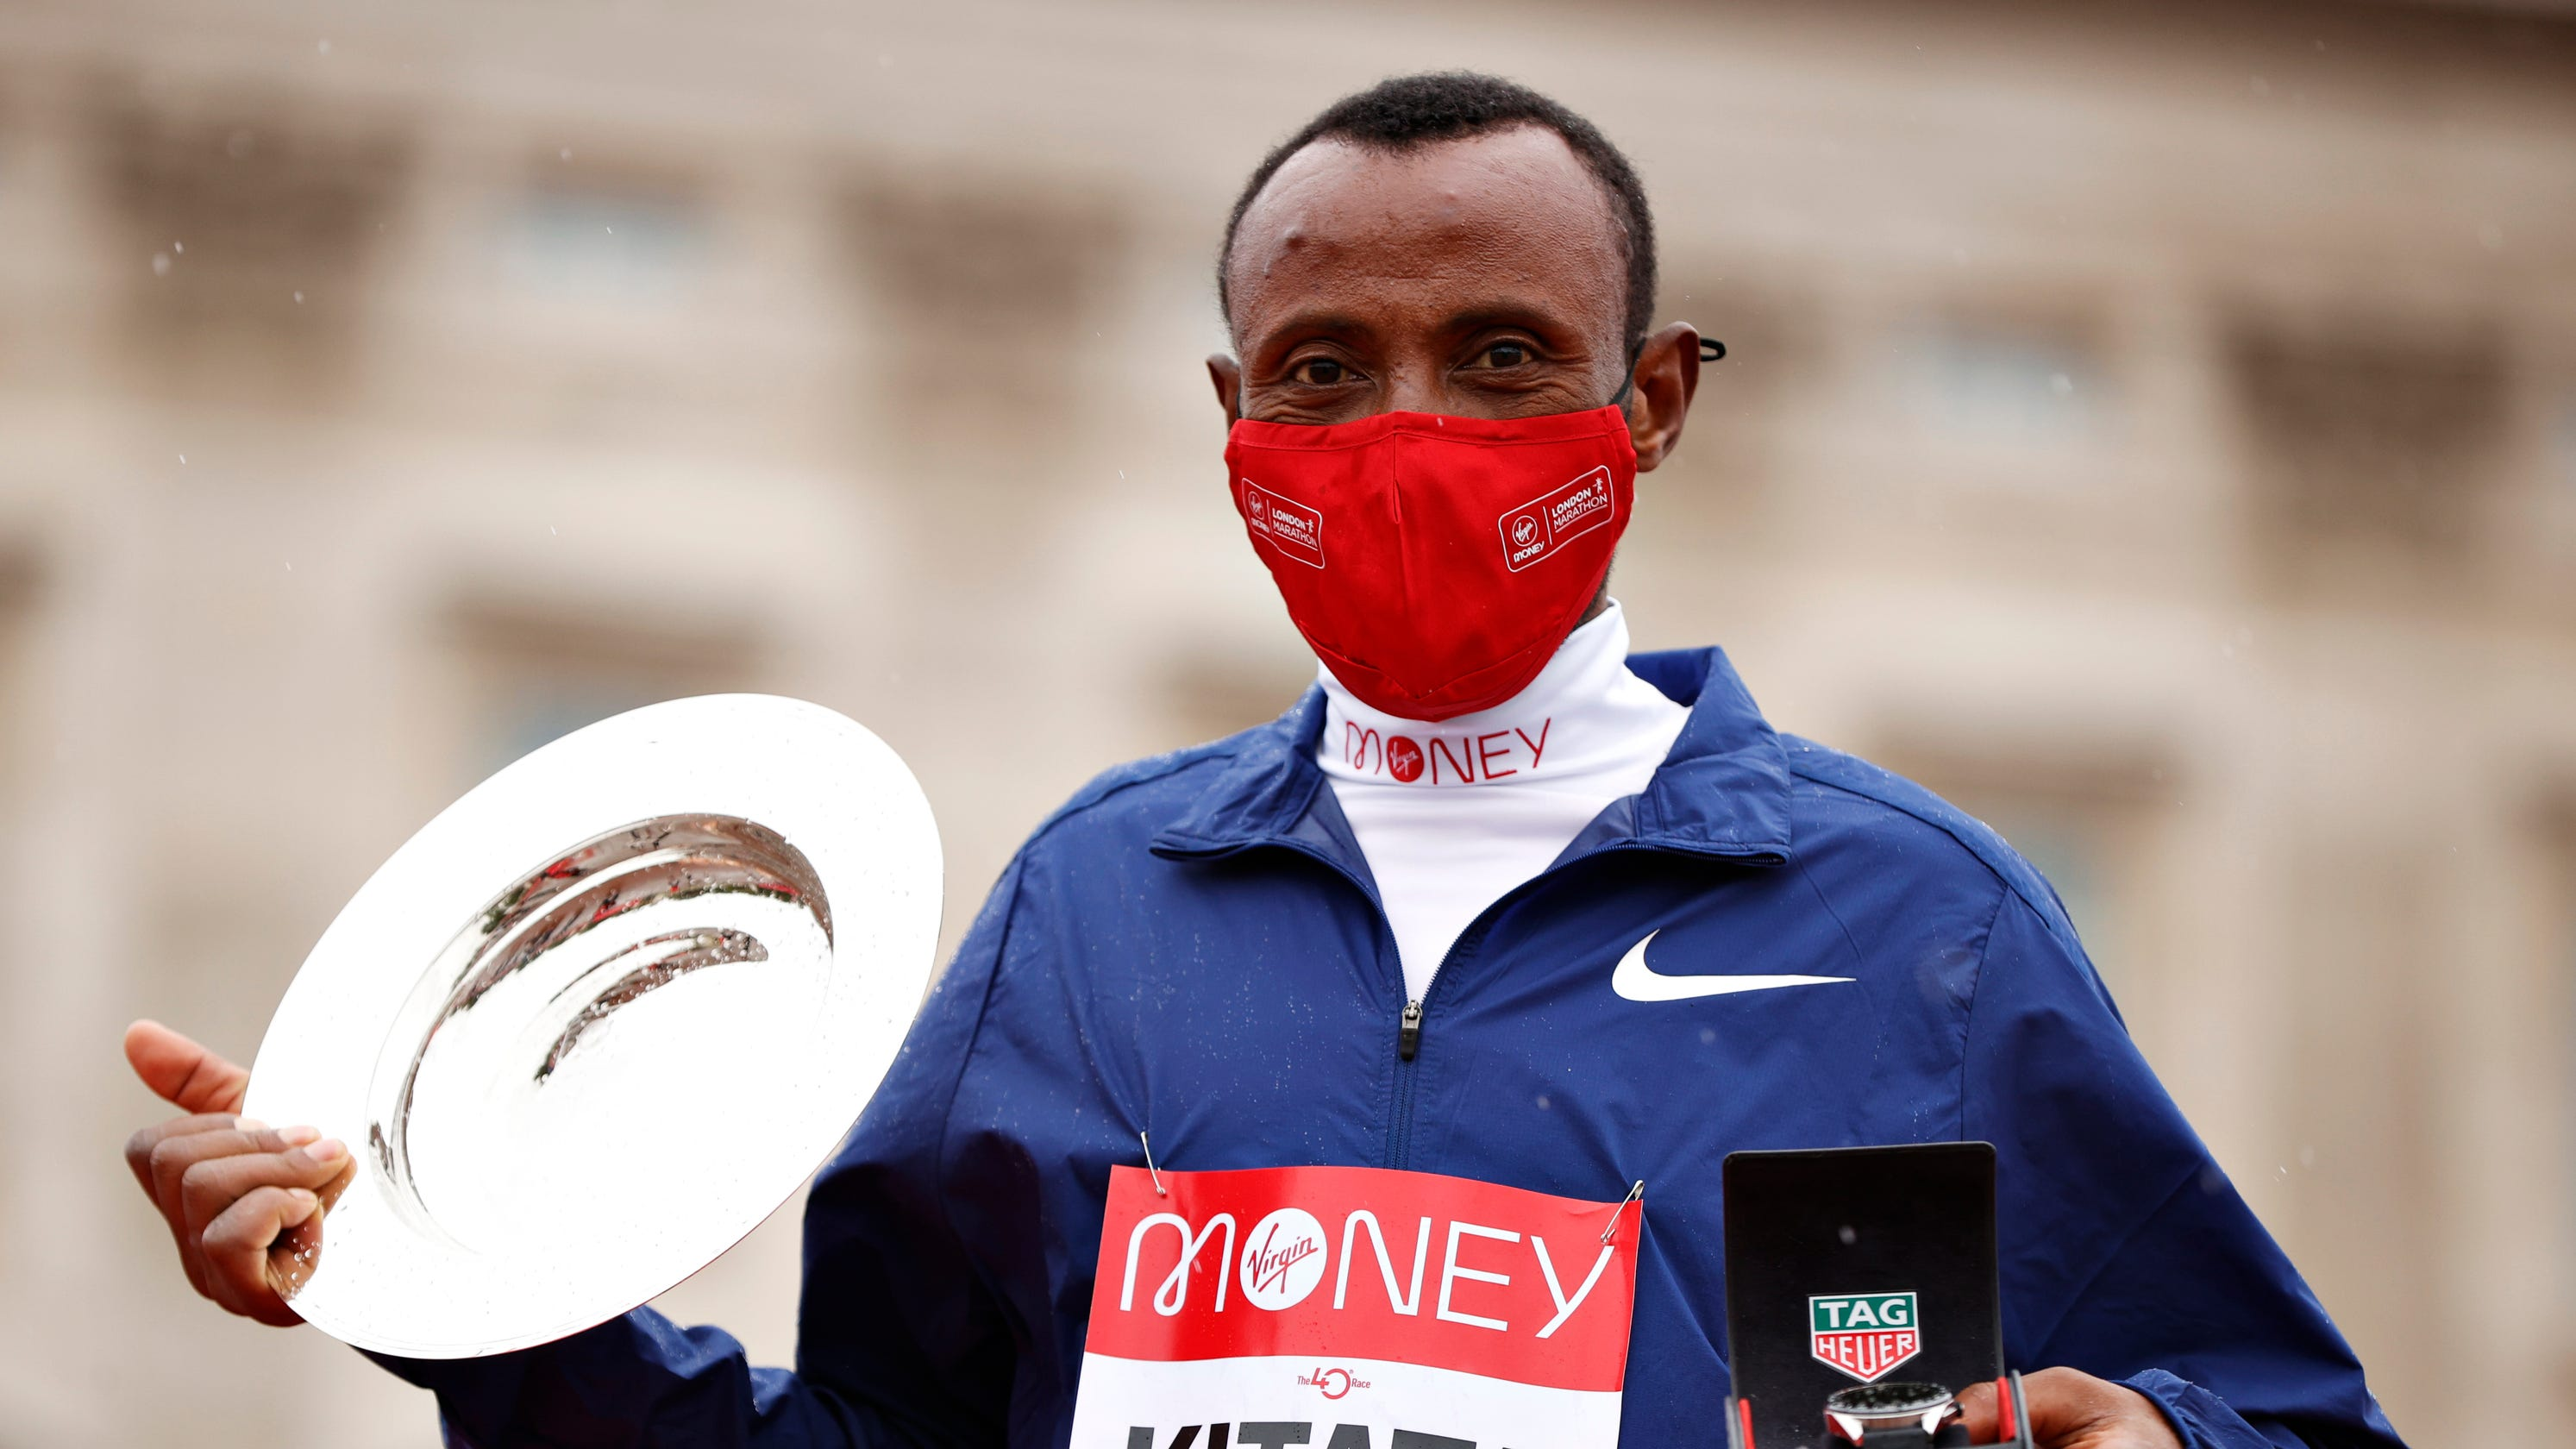 Shura Kitata upsets Eliud Kipchoge to win London Marathon, USA's Sara Hall finishes second in women's race